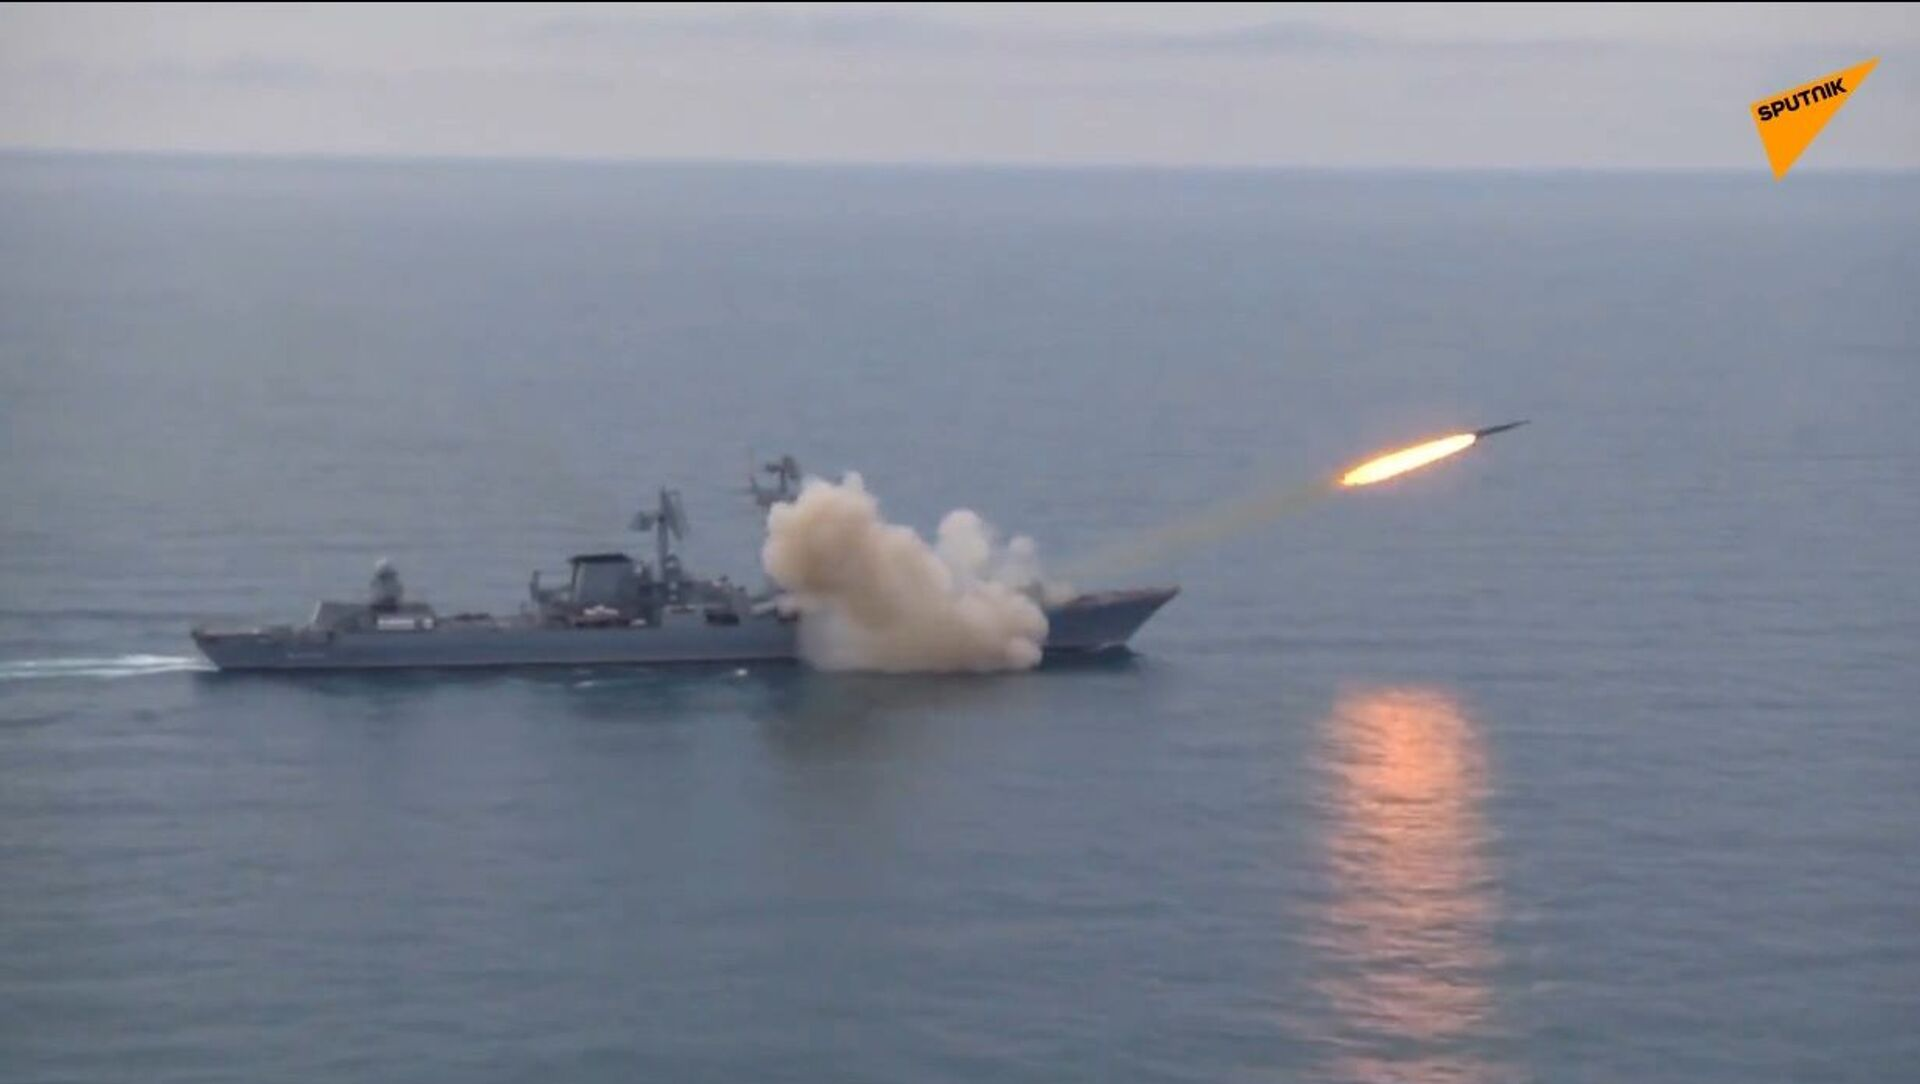 Incrociatore russo testa missile Vulkan nel Mar Nero - Sputnik Italia, 1920, 30.04.2021